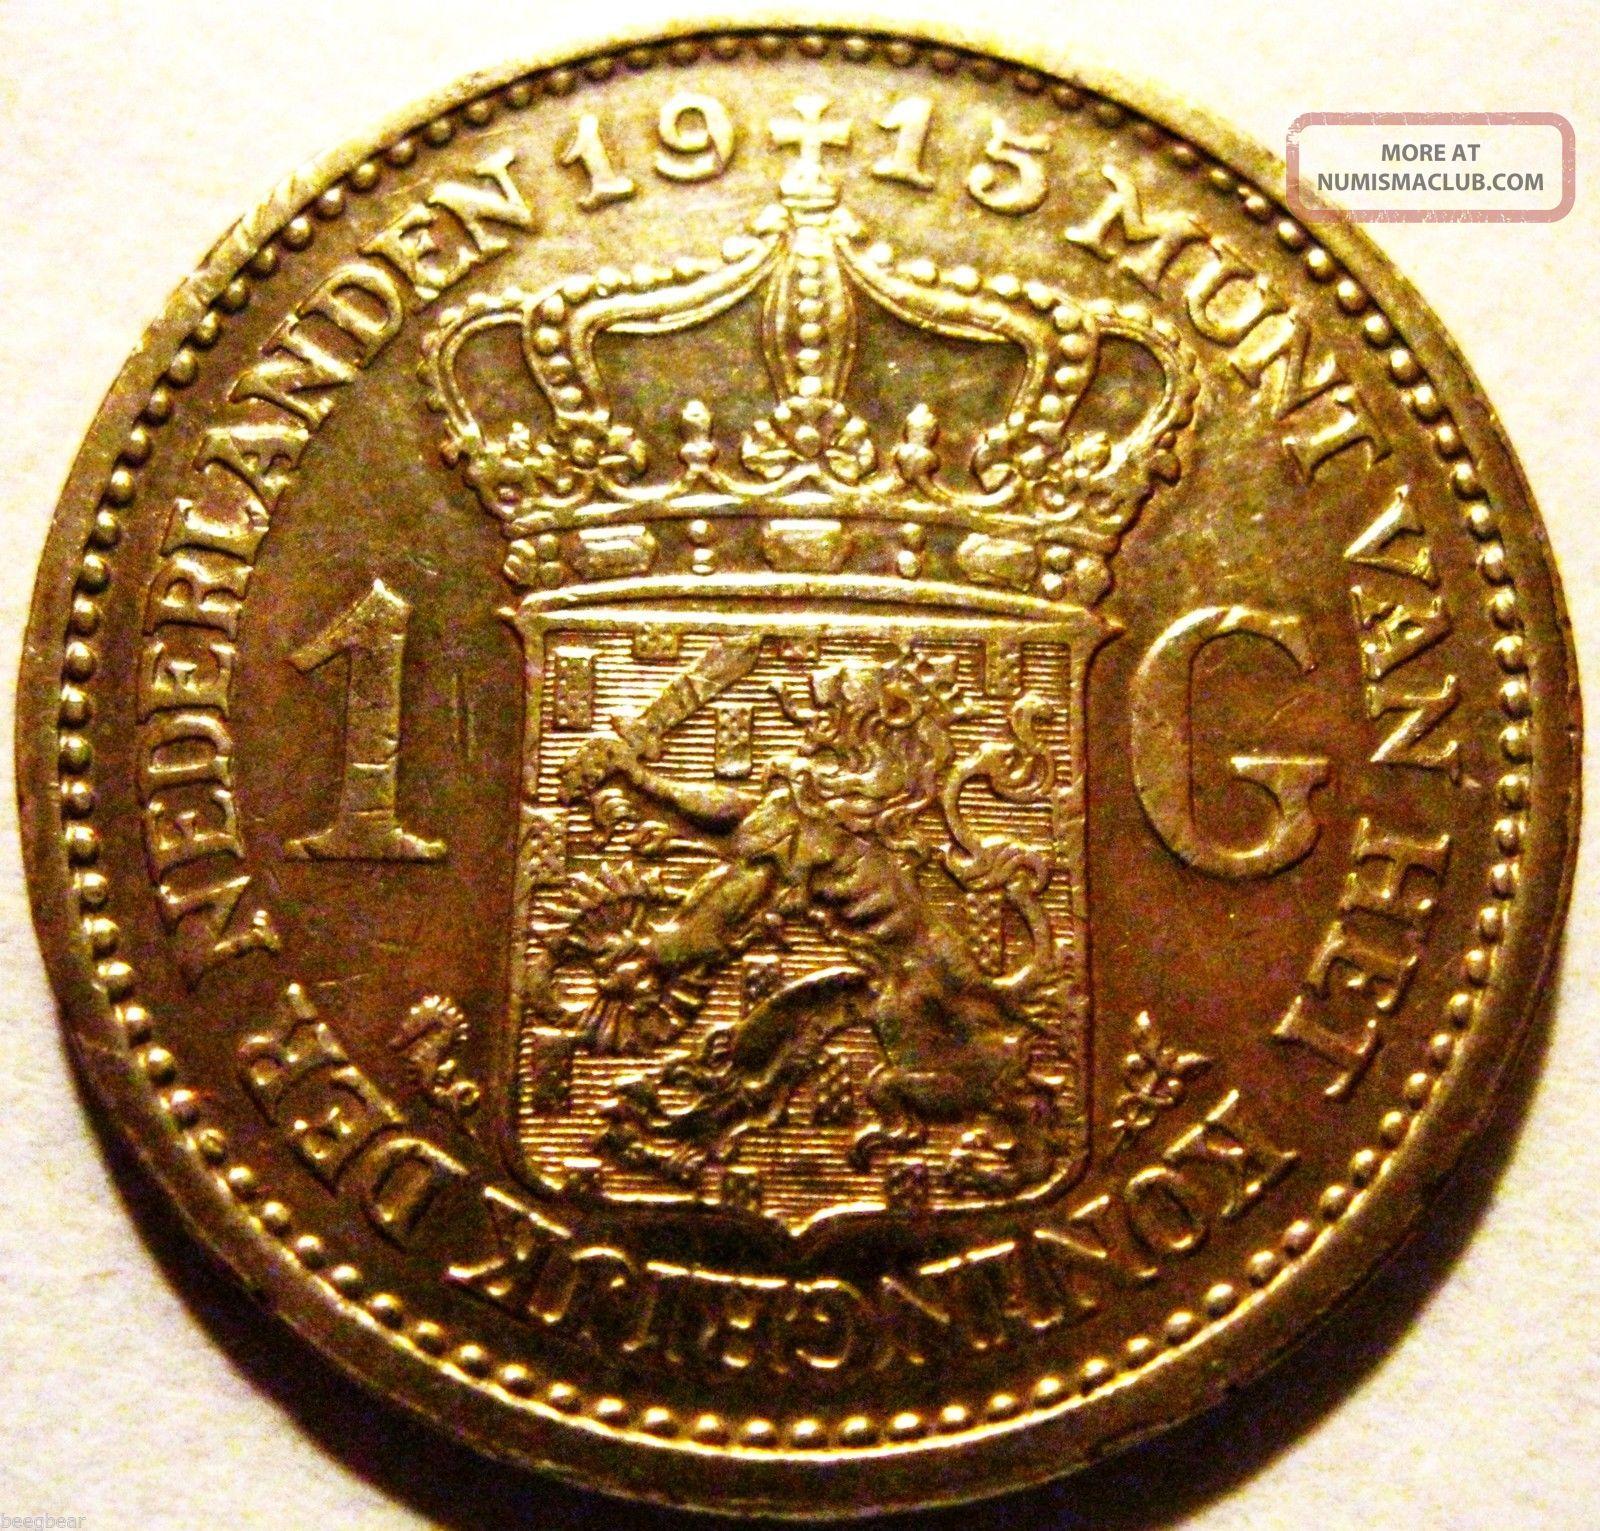 1915 1 Guilder (gulden) Toning & Eye Appeal Europe photo